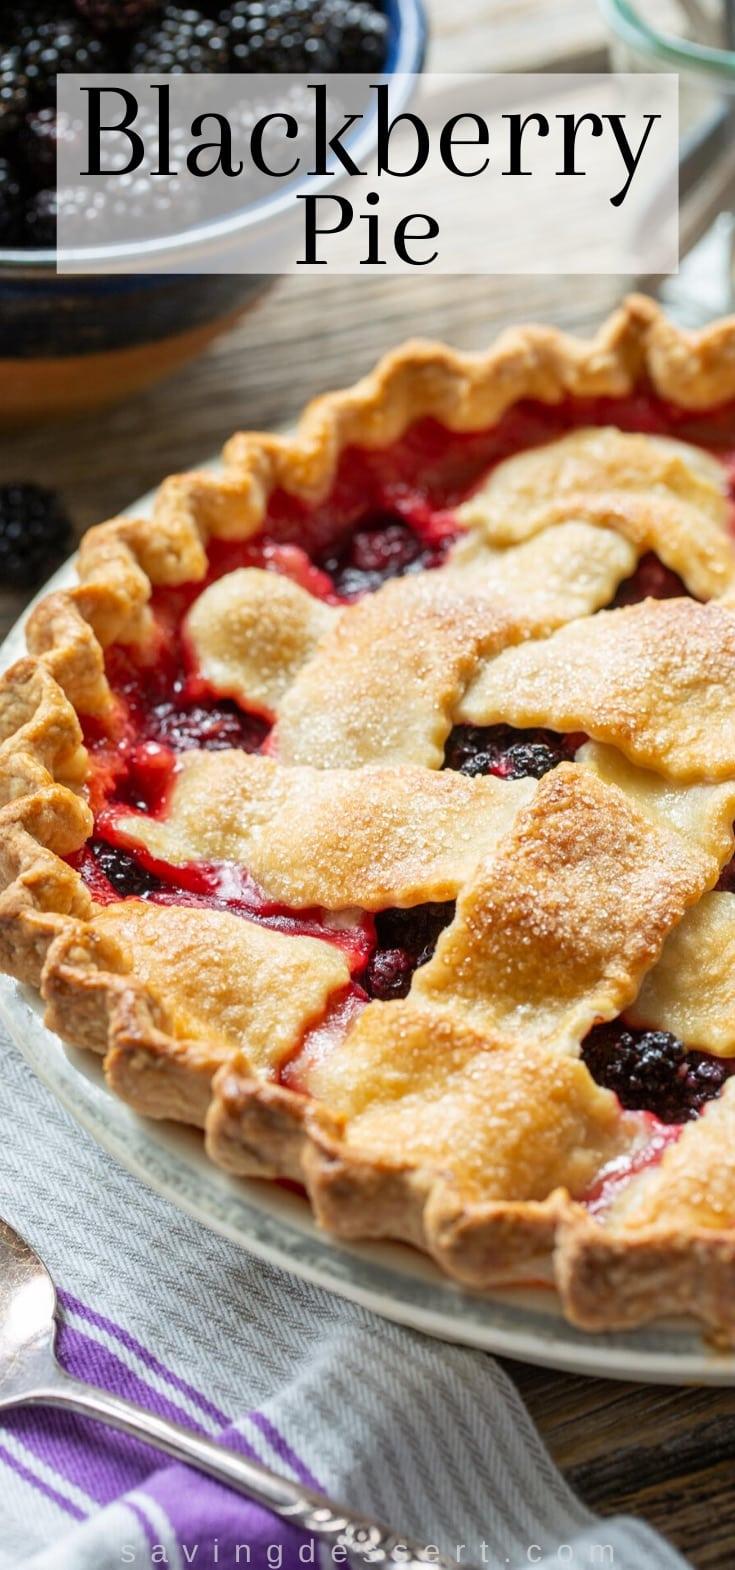 A homemade blackberry pie with purple juices poking through the lattice crust